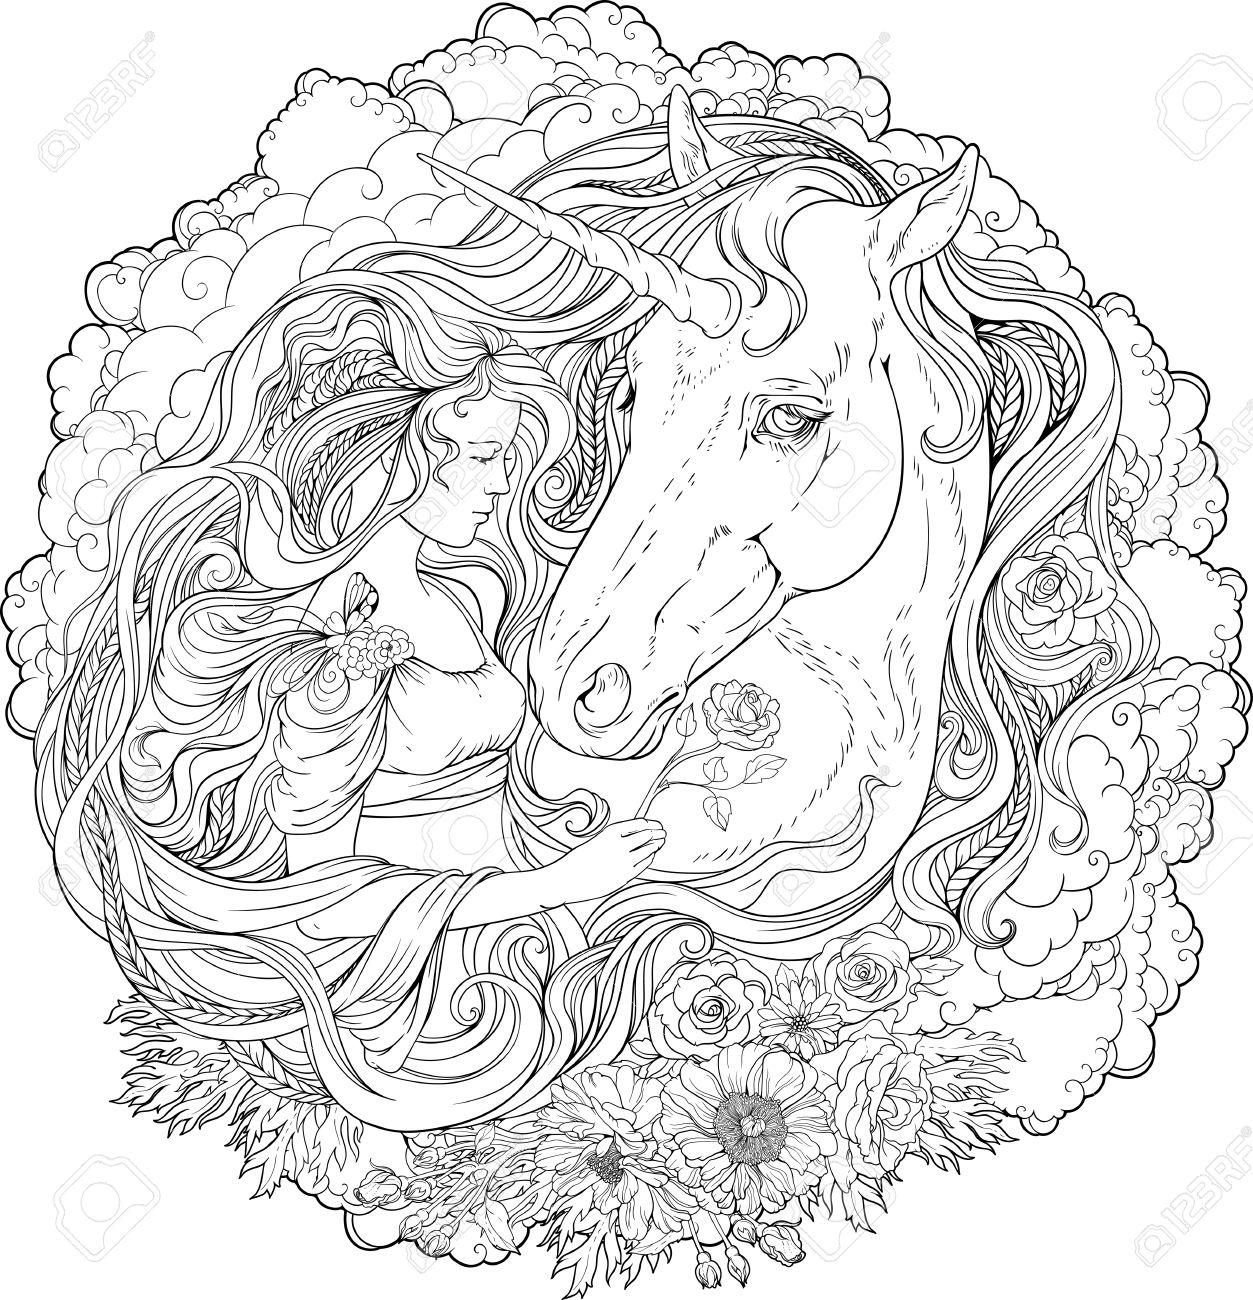 Hermosa Libros Para Colorear De Unicornio Composición - Enmarcado ...